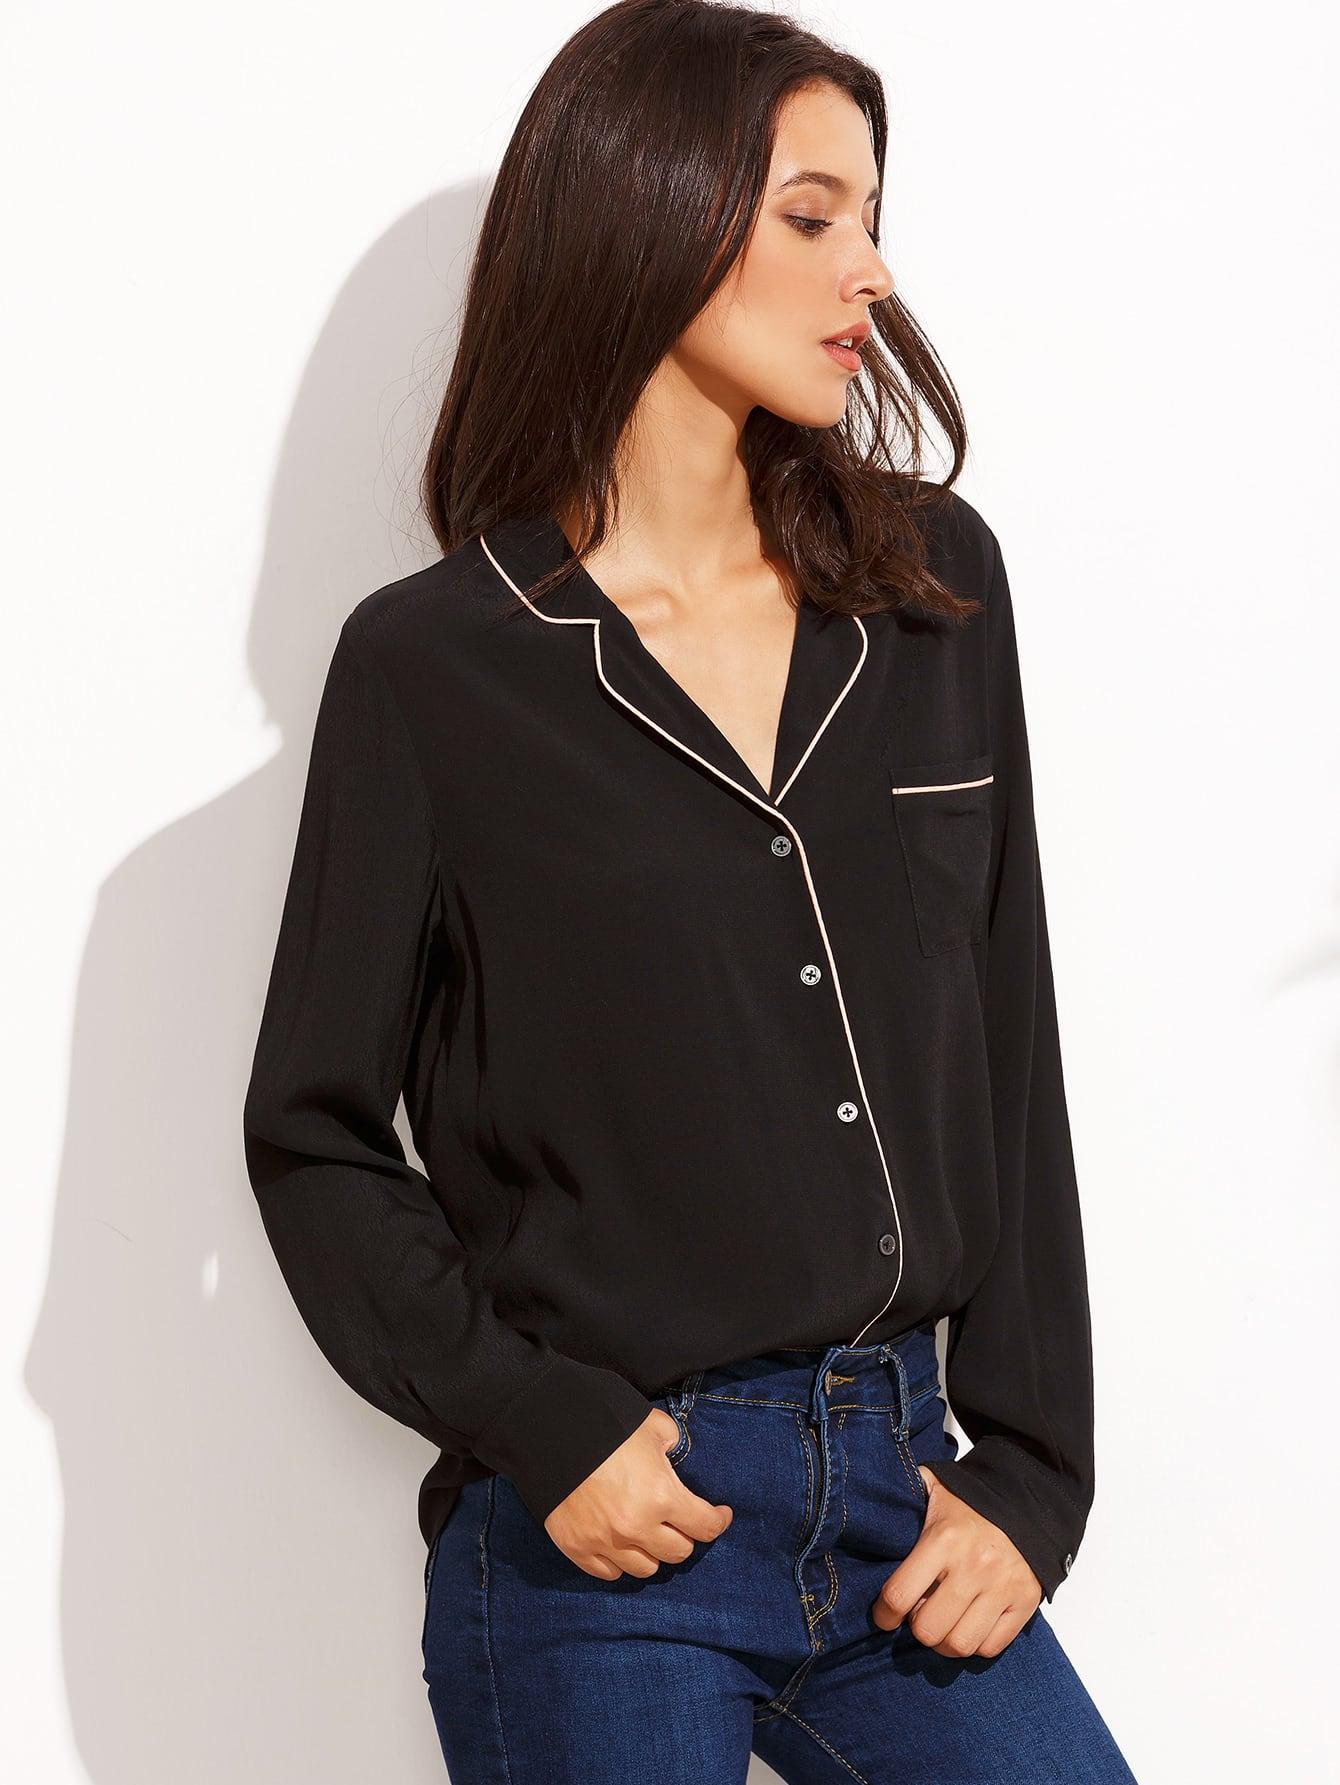 blouse160726706_5